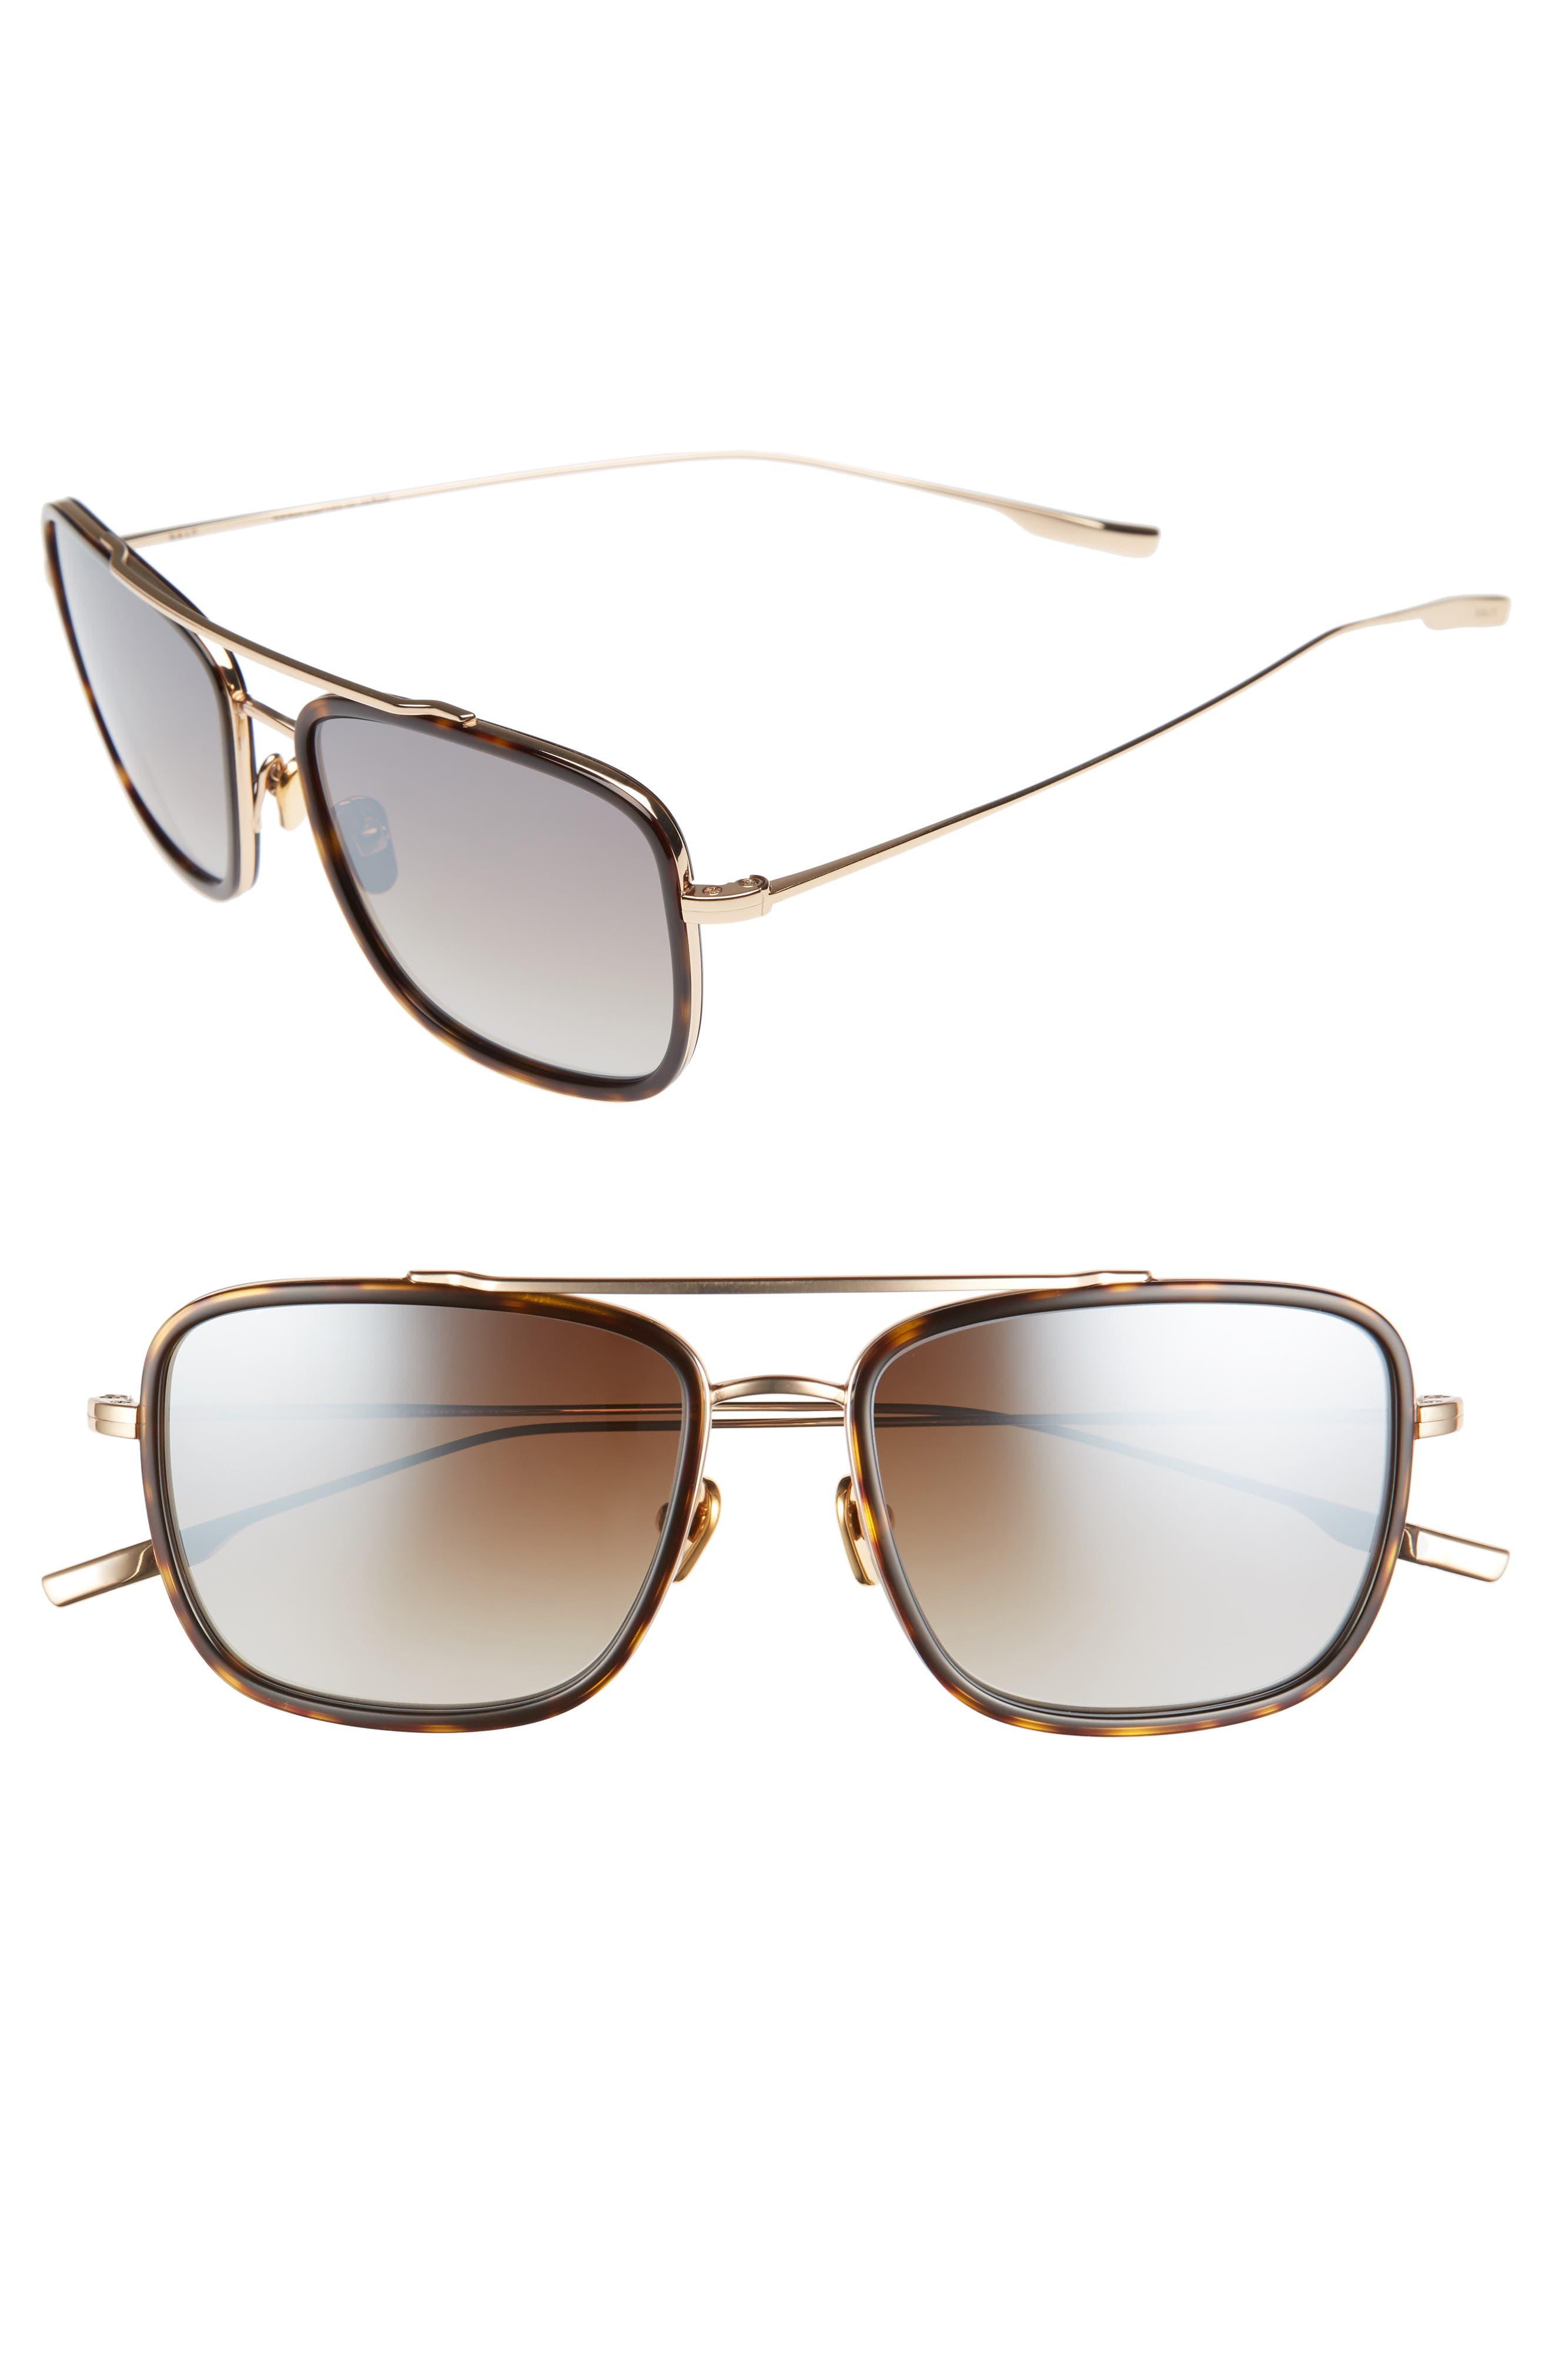 Harrison 54mm Polarized Sunglasses,                         Main,                         color, HONEY GOLD/ OILED BARK